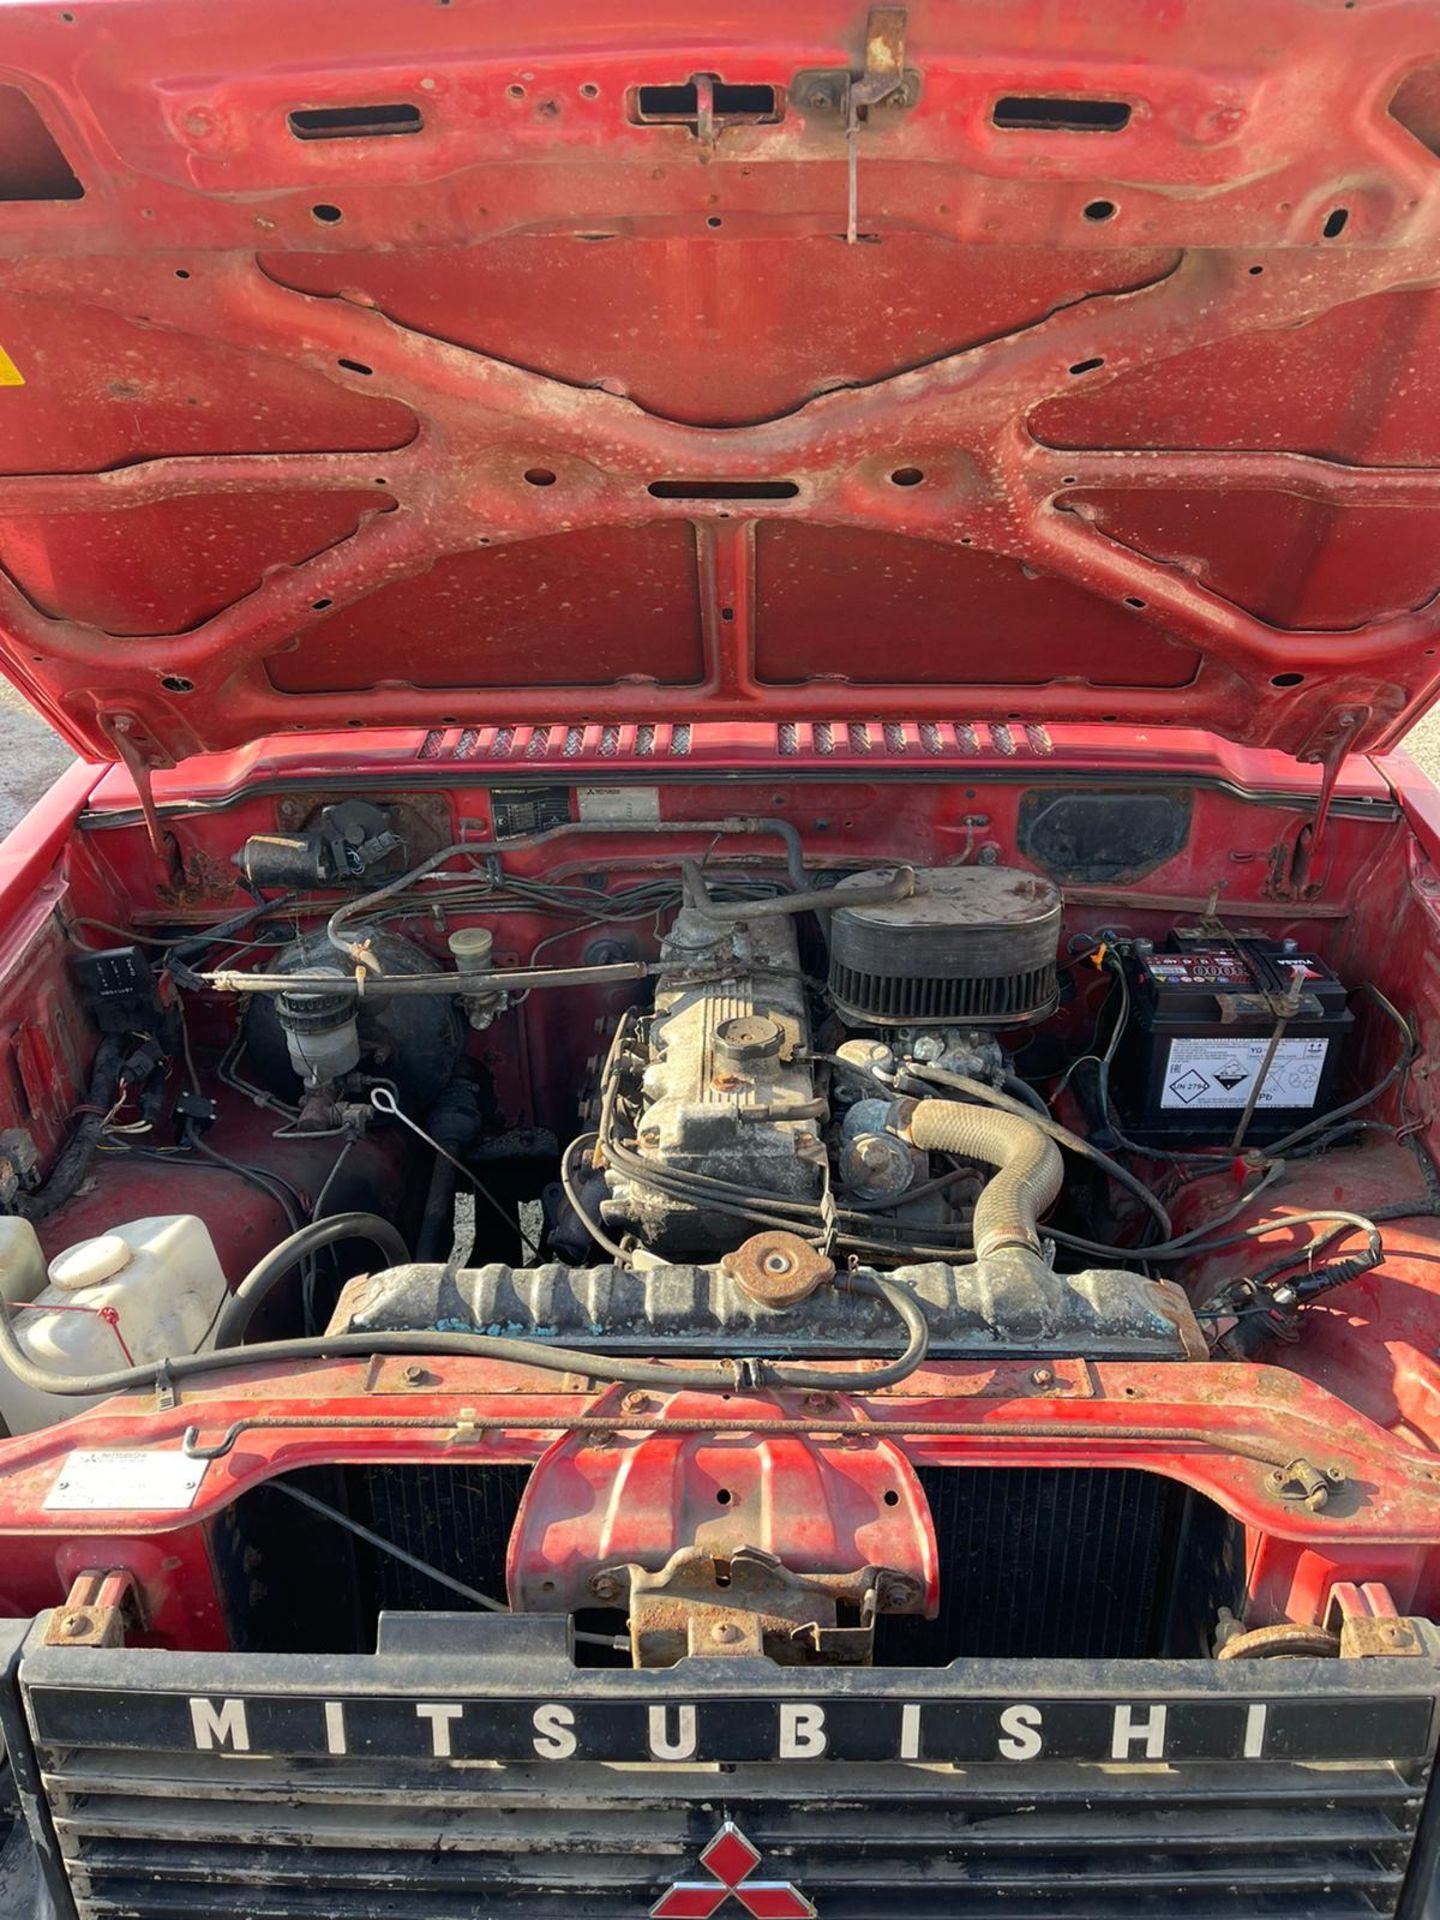 1987 MITSUBISHI SHOGUN SWB V6, BARN FIND, PETROL ENGINE, SHOWING 9 PERVIOUS KEEPERS *NO VAT* - Image 12 of 16